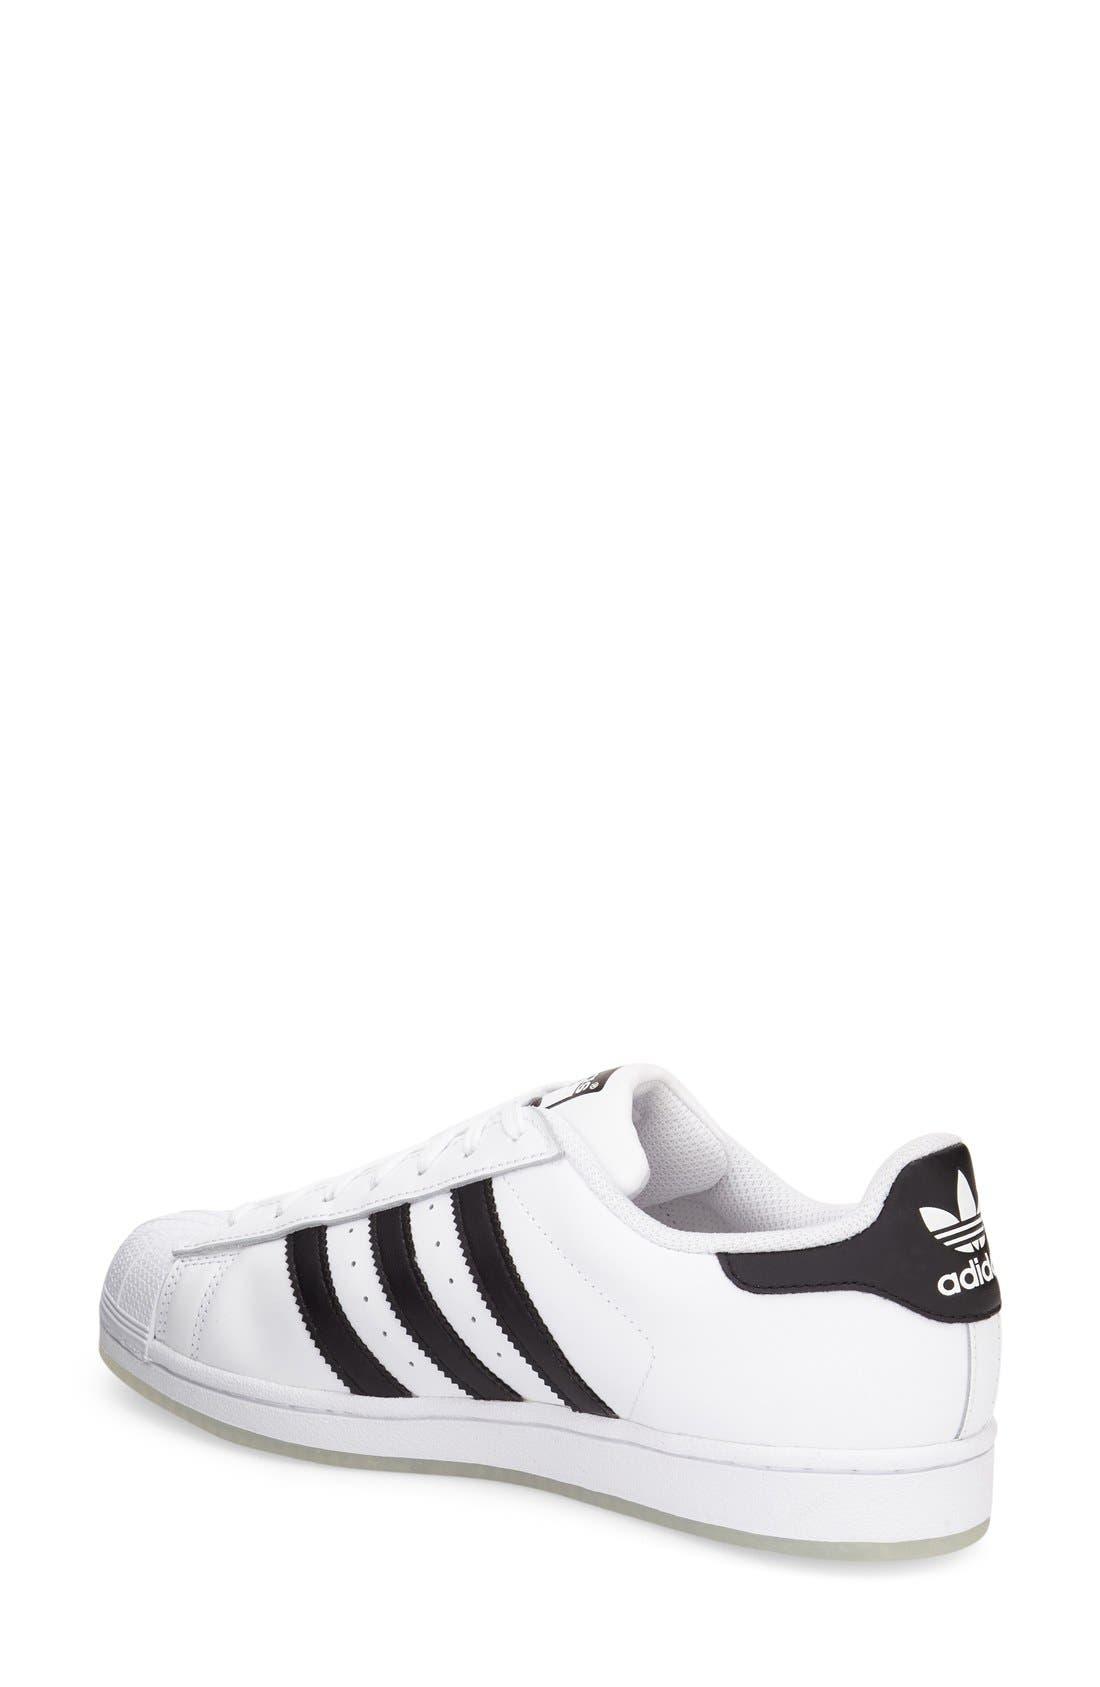 Alternate Image 3  - adidas 'Superstar' Sneaker (Women)